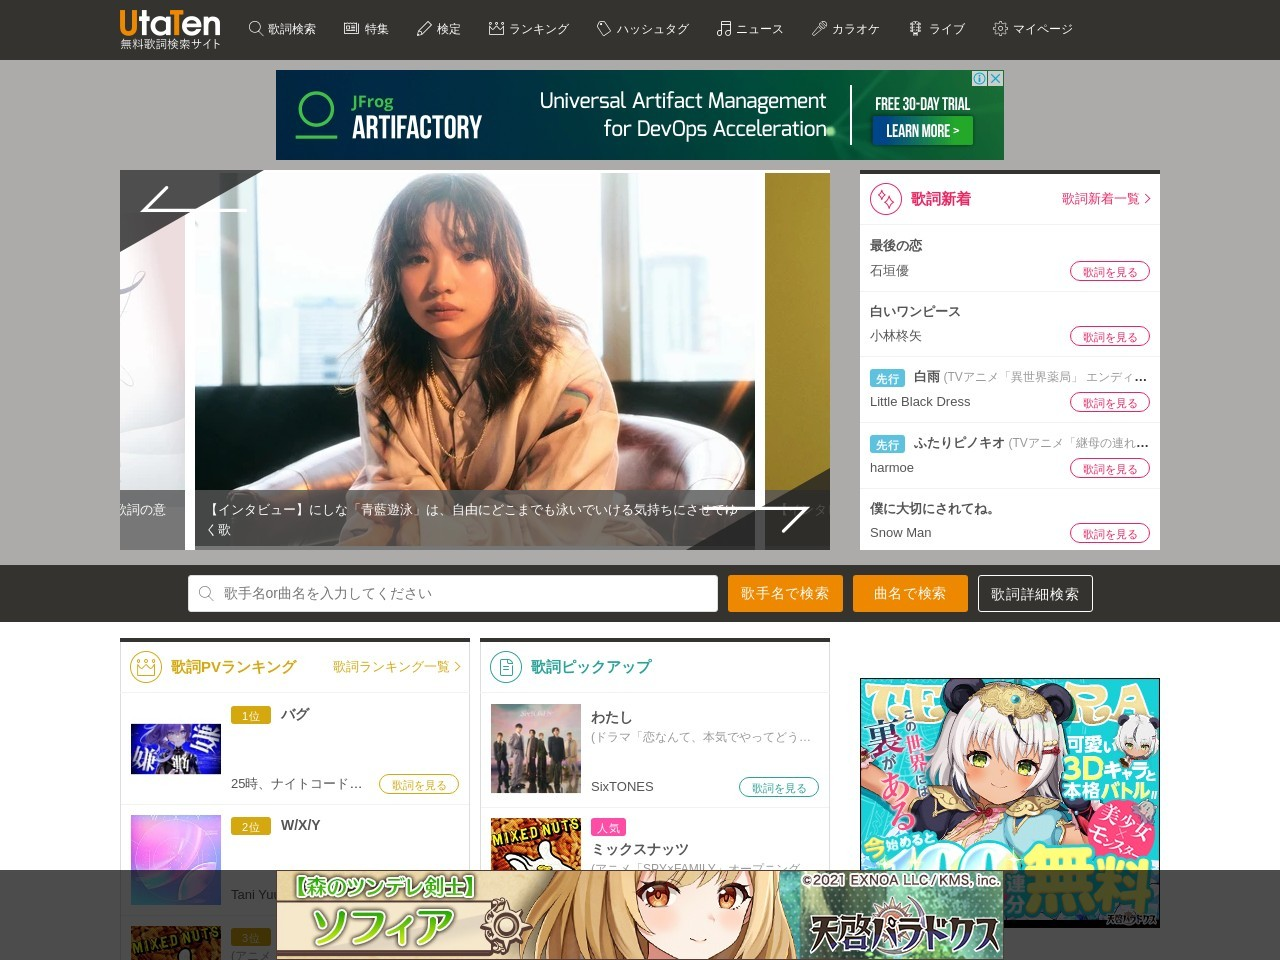 「BENI」の歌詞・動画・ニュース一覧|歌詞検索サイト【UtaTen】